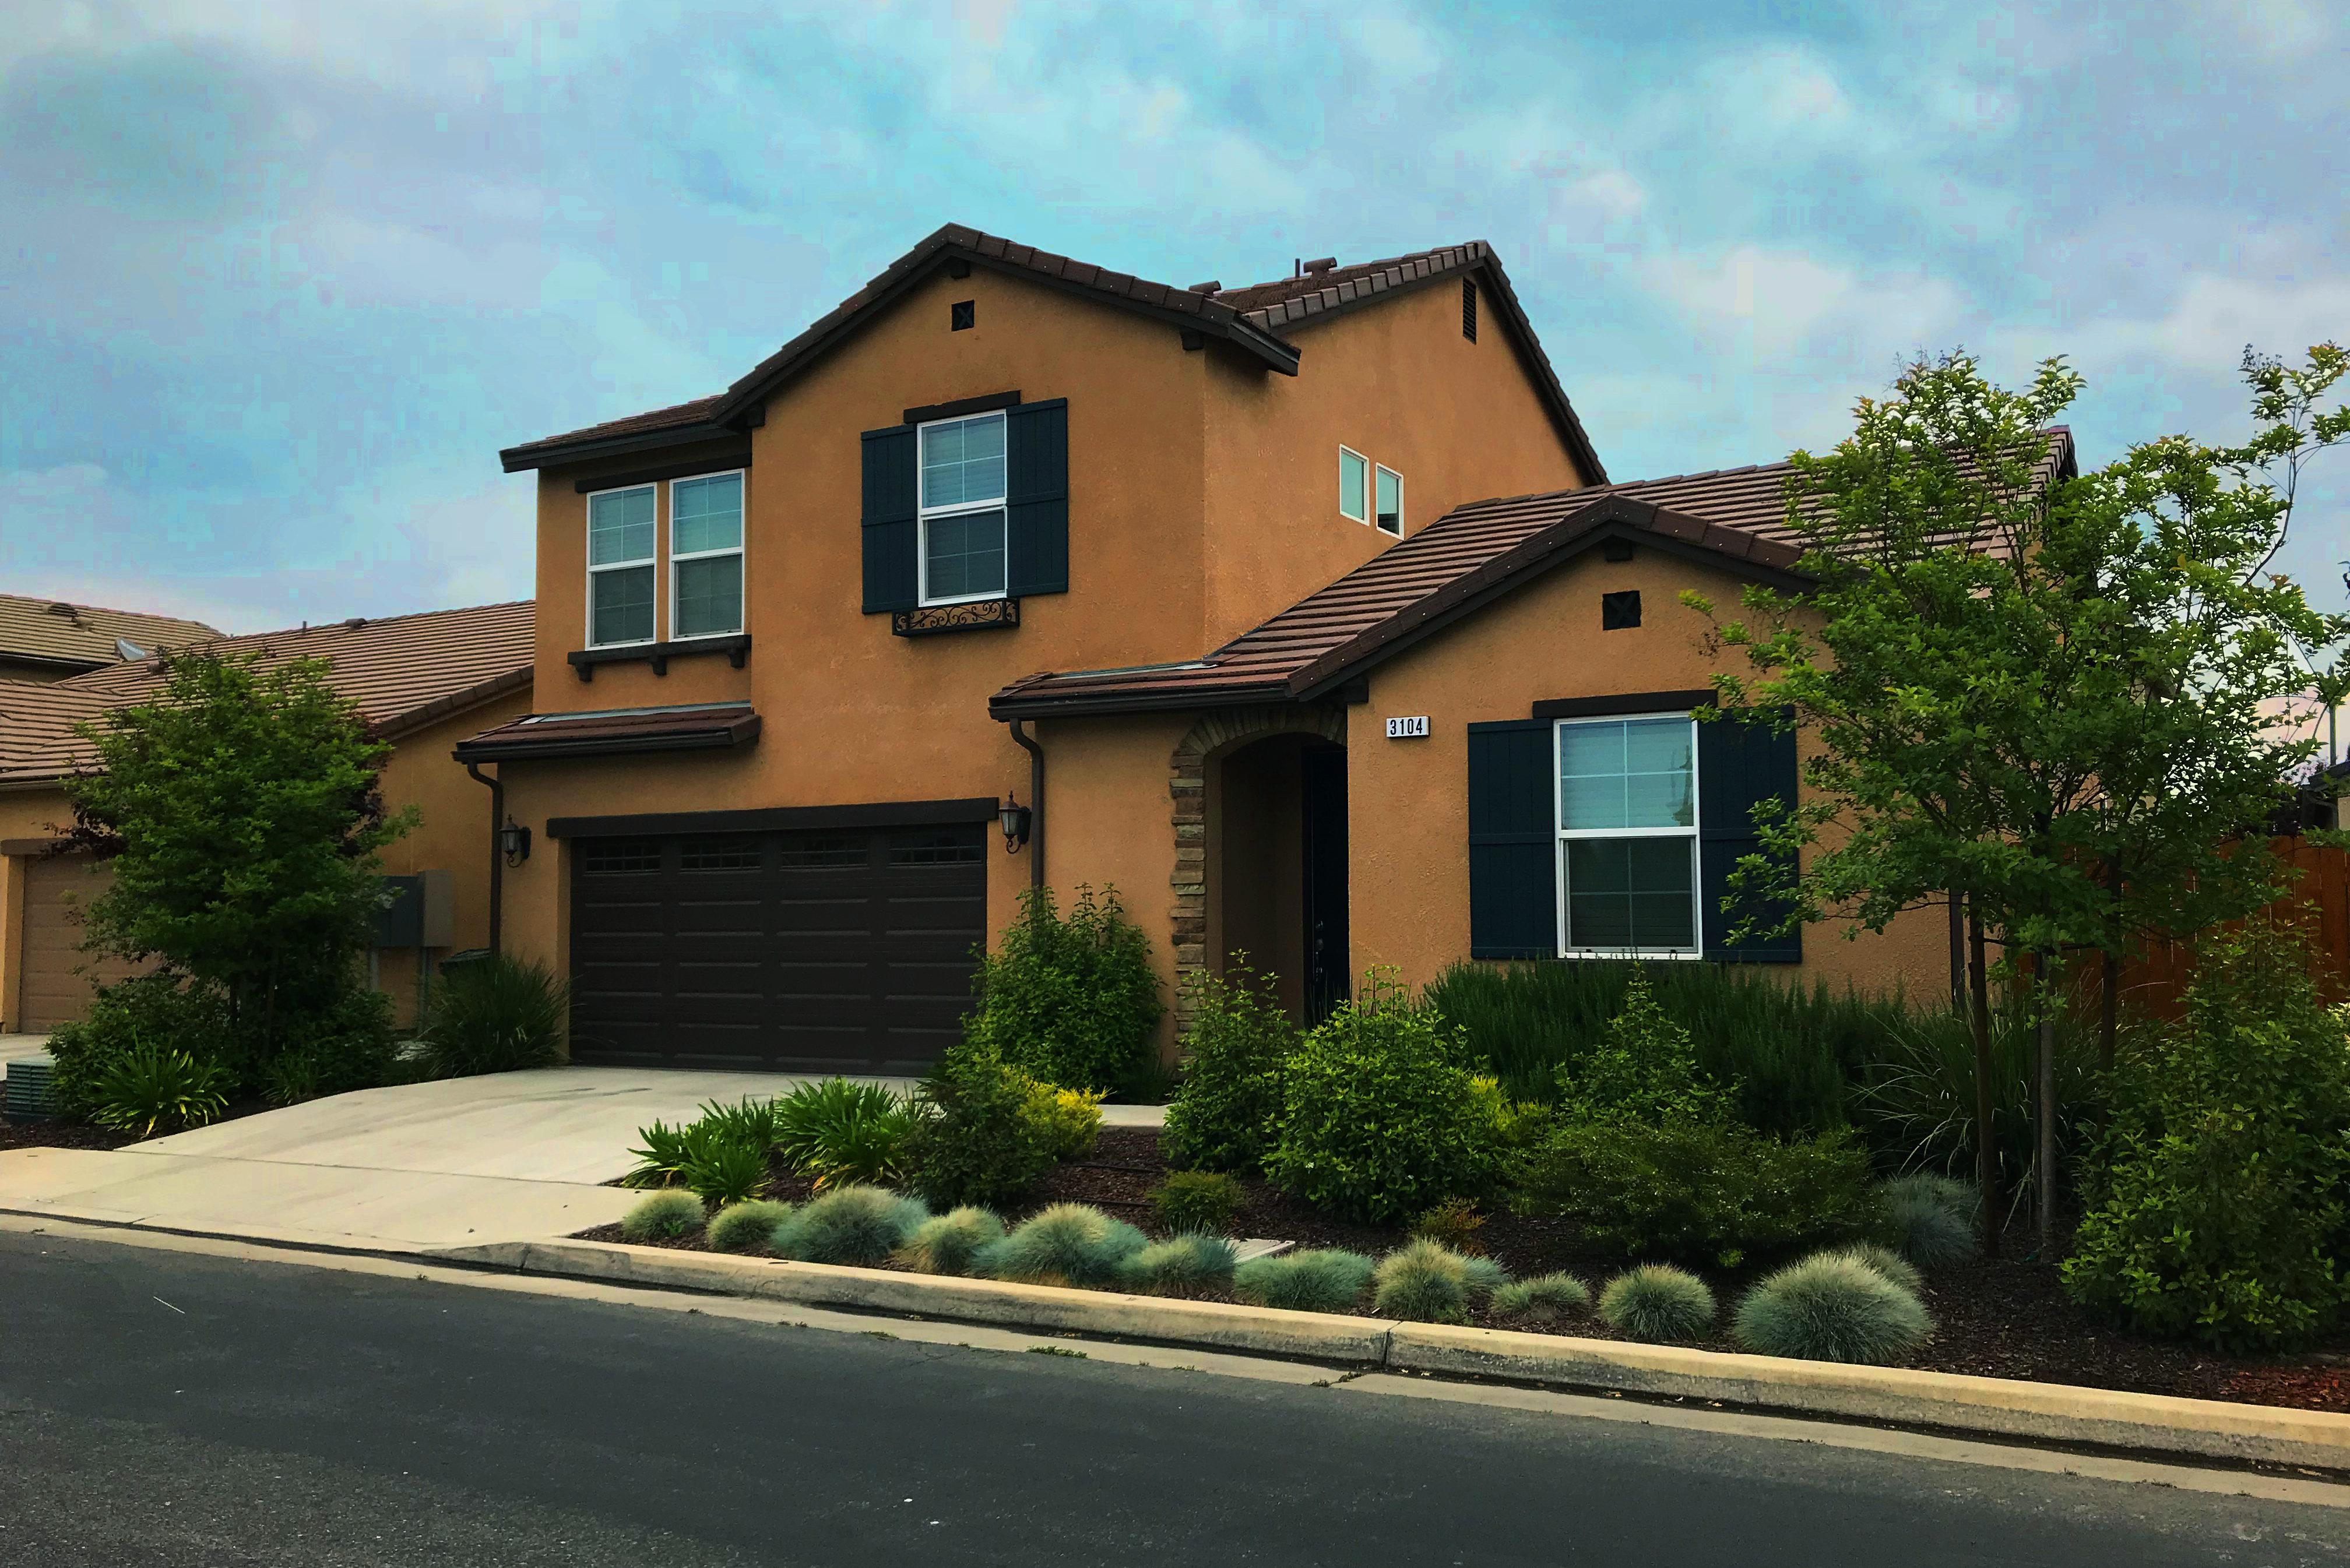 A dark brownish orange house with garage, Professional Management Services